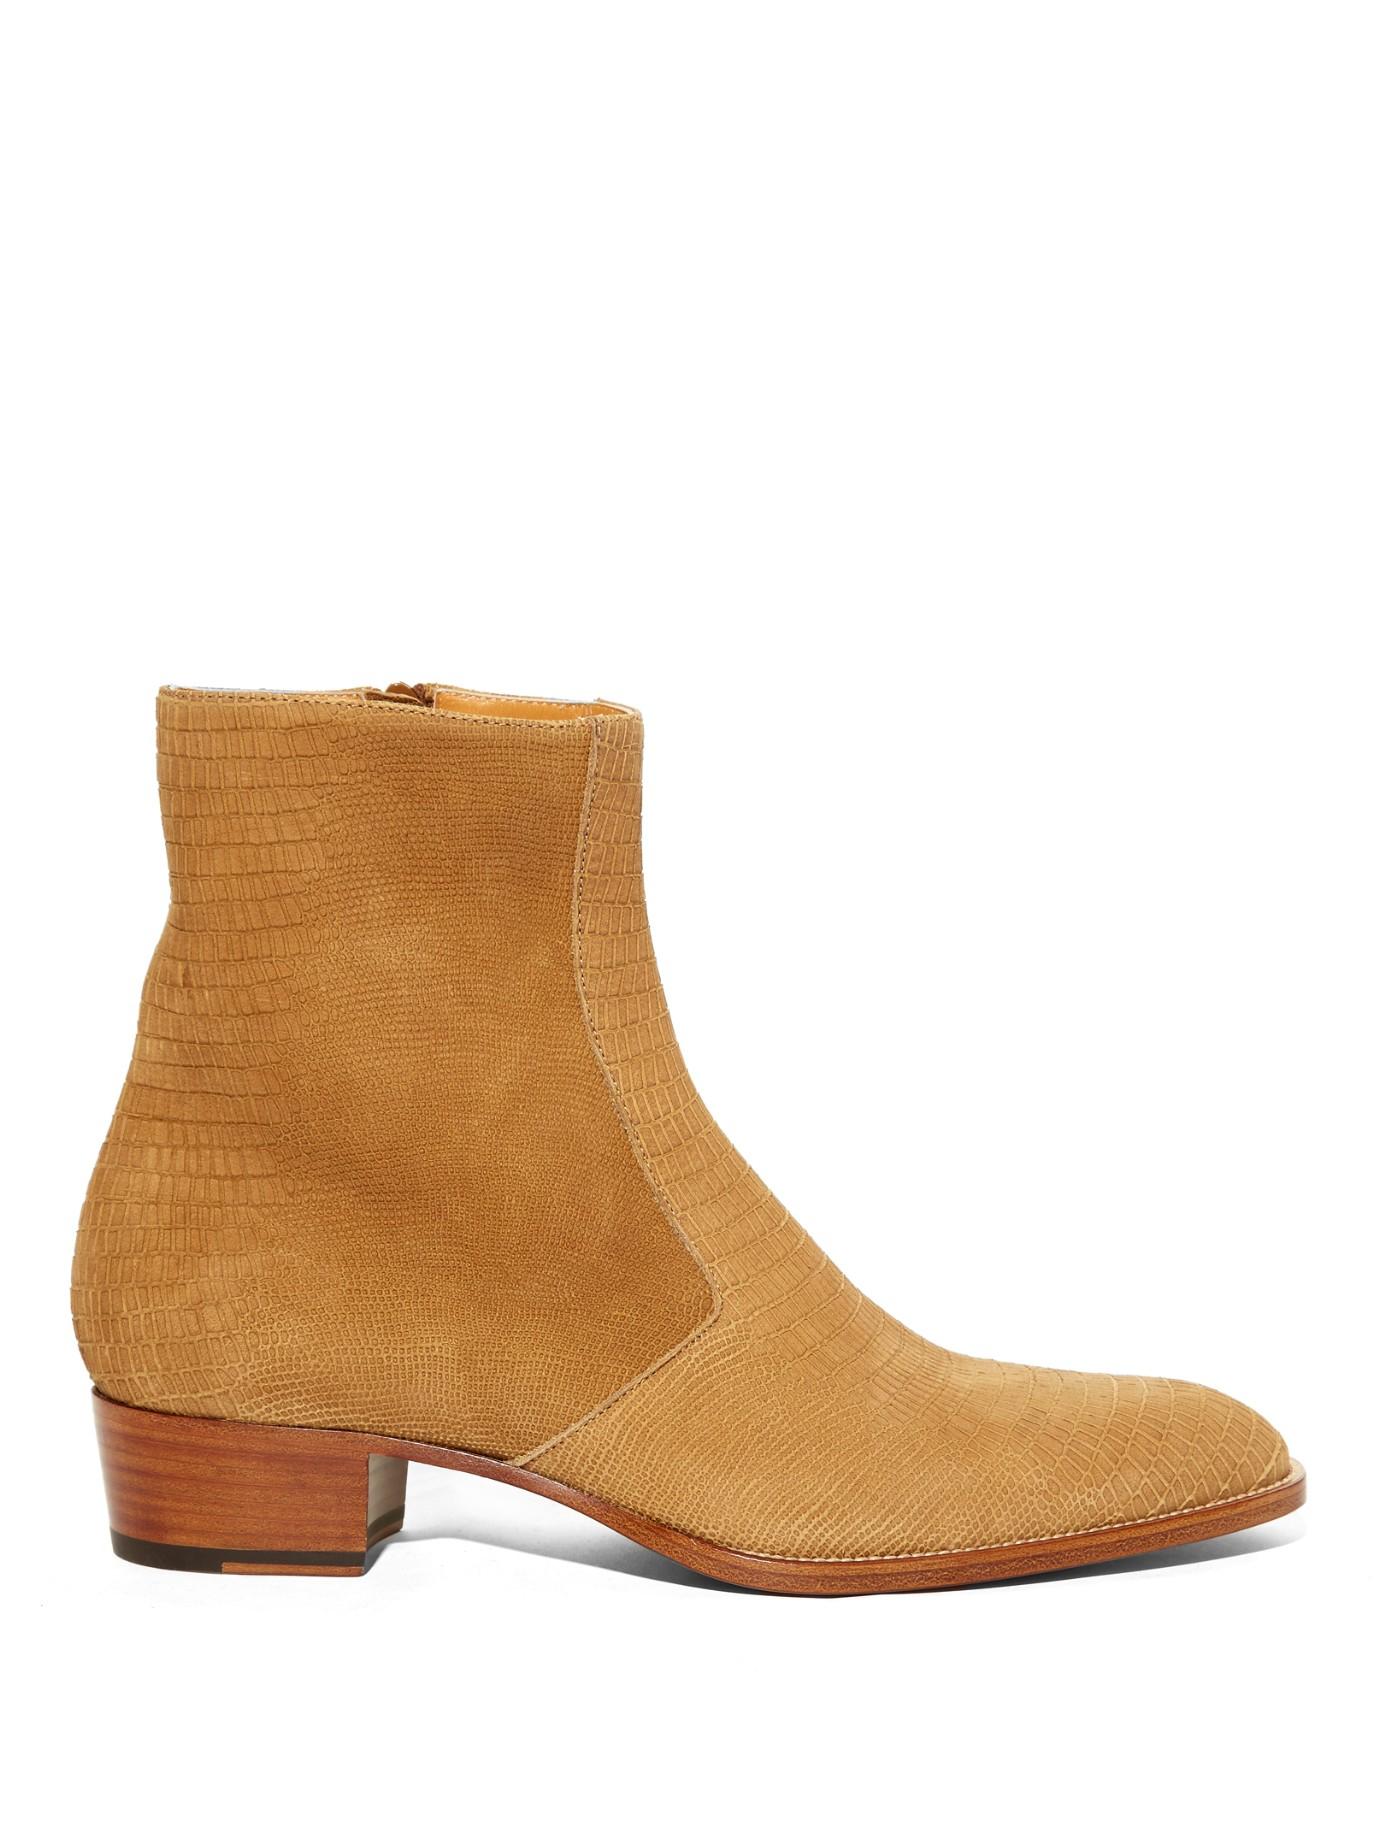 61f4dcd2ce5 Saint Laurent Lizard-Effect Suede Chelsea Boots in Brown for Men - Lyst